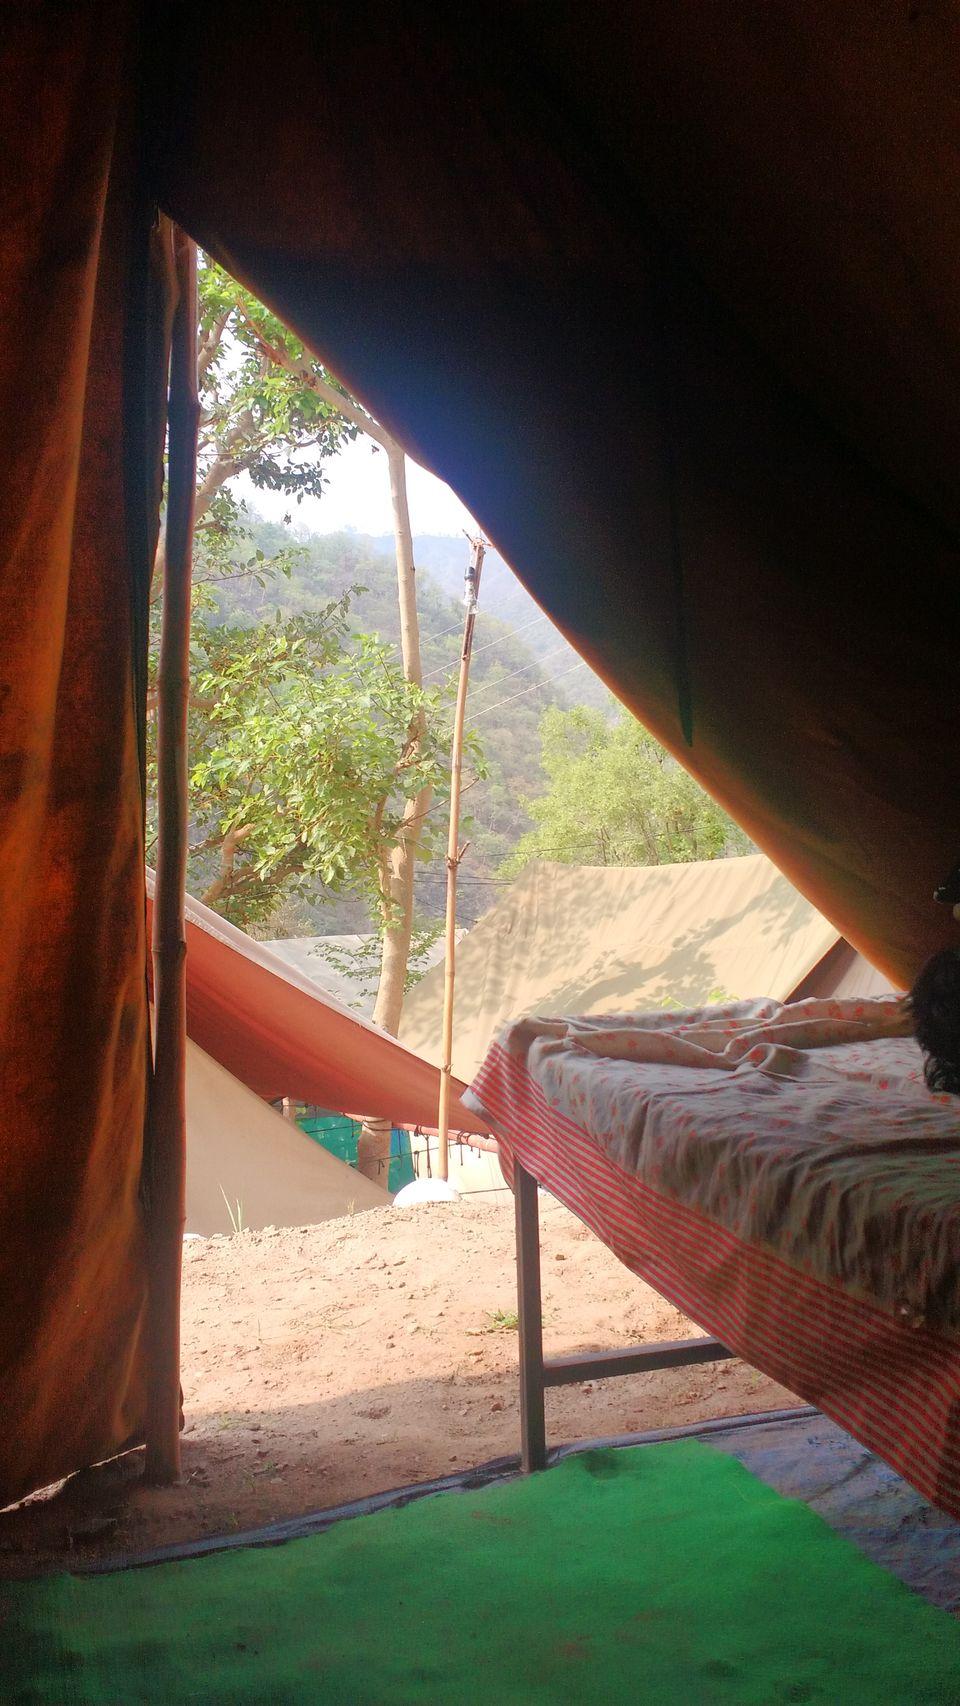 Photo of camp eagles nest, Singtali, Uttarakhand, India by theuncanny_traveller